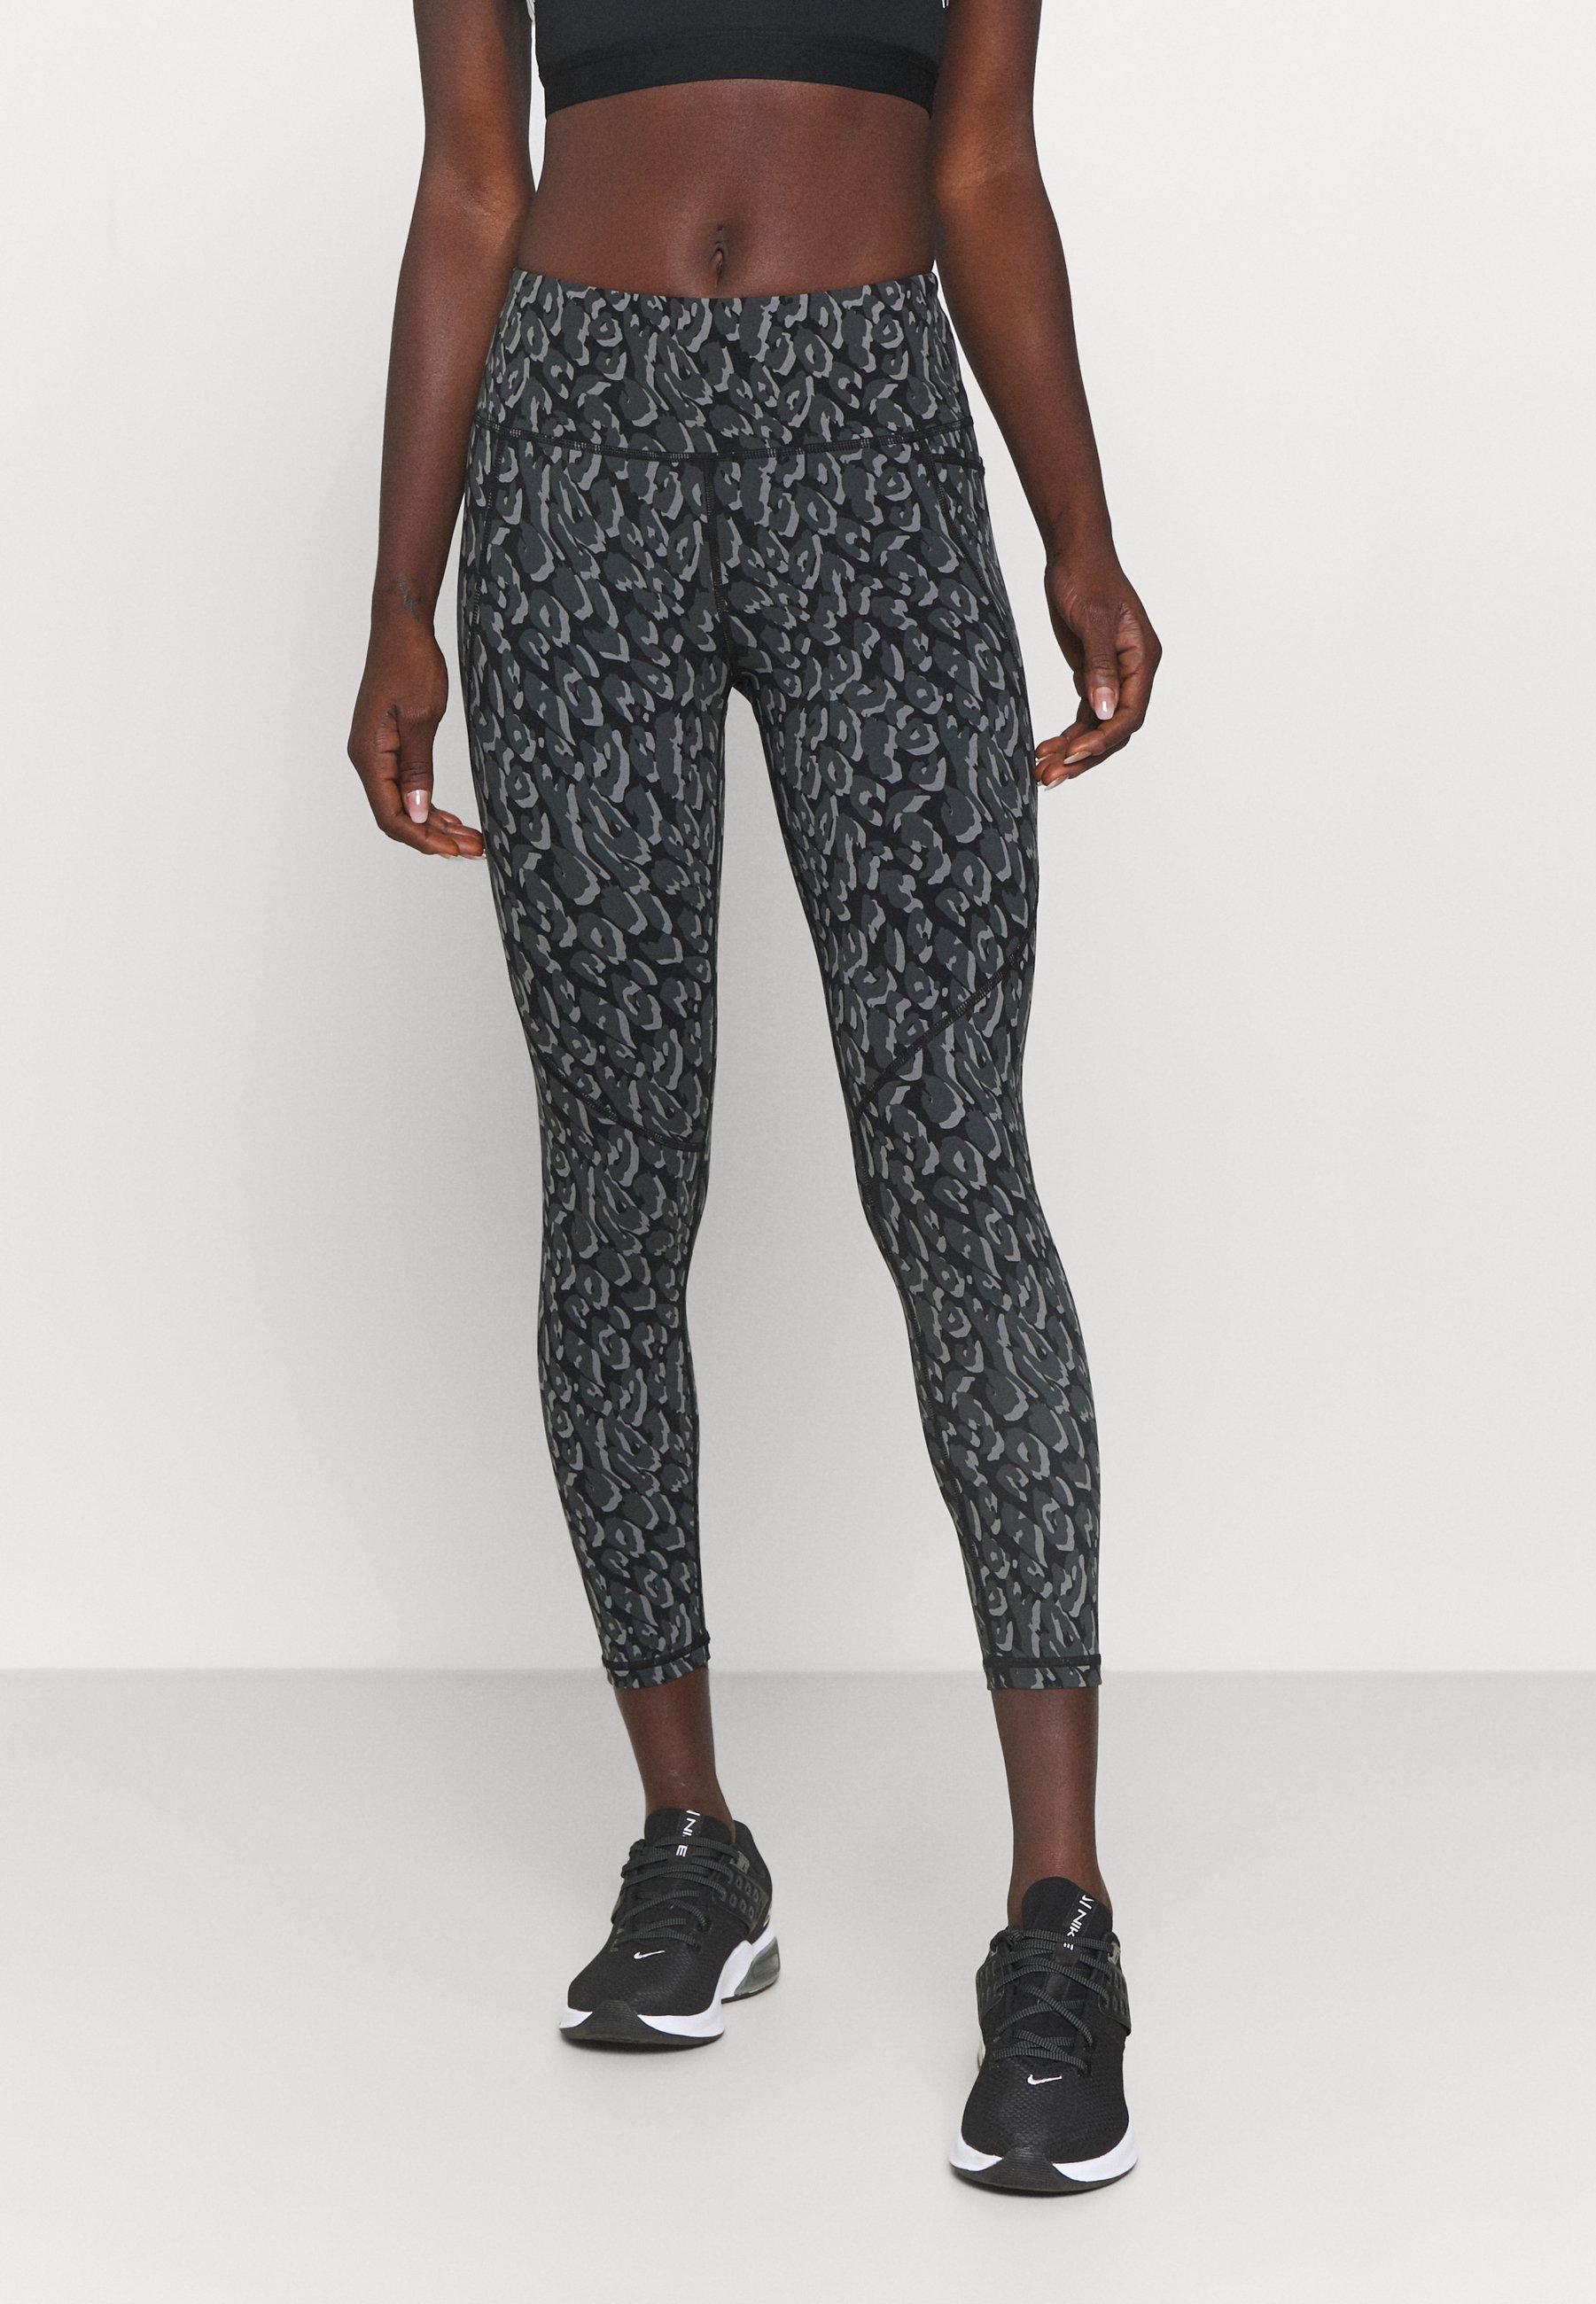 Femme POWER 7/8 WORKOUT LEGGINGS - Collants